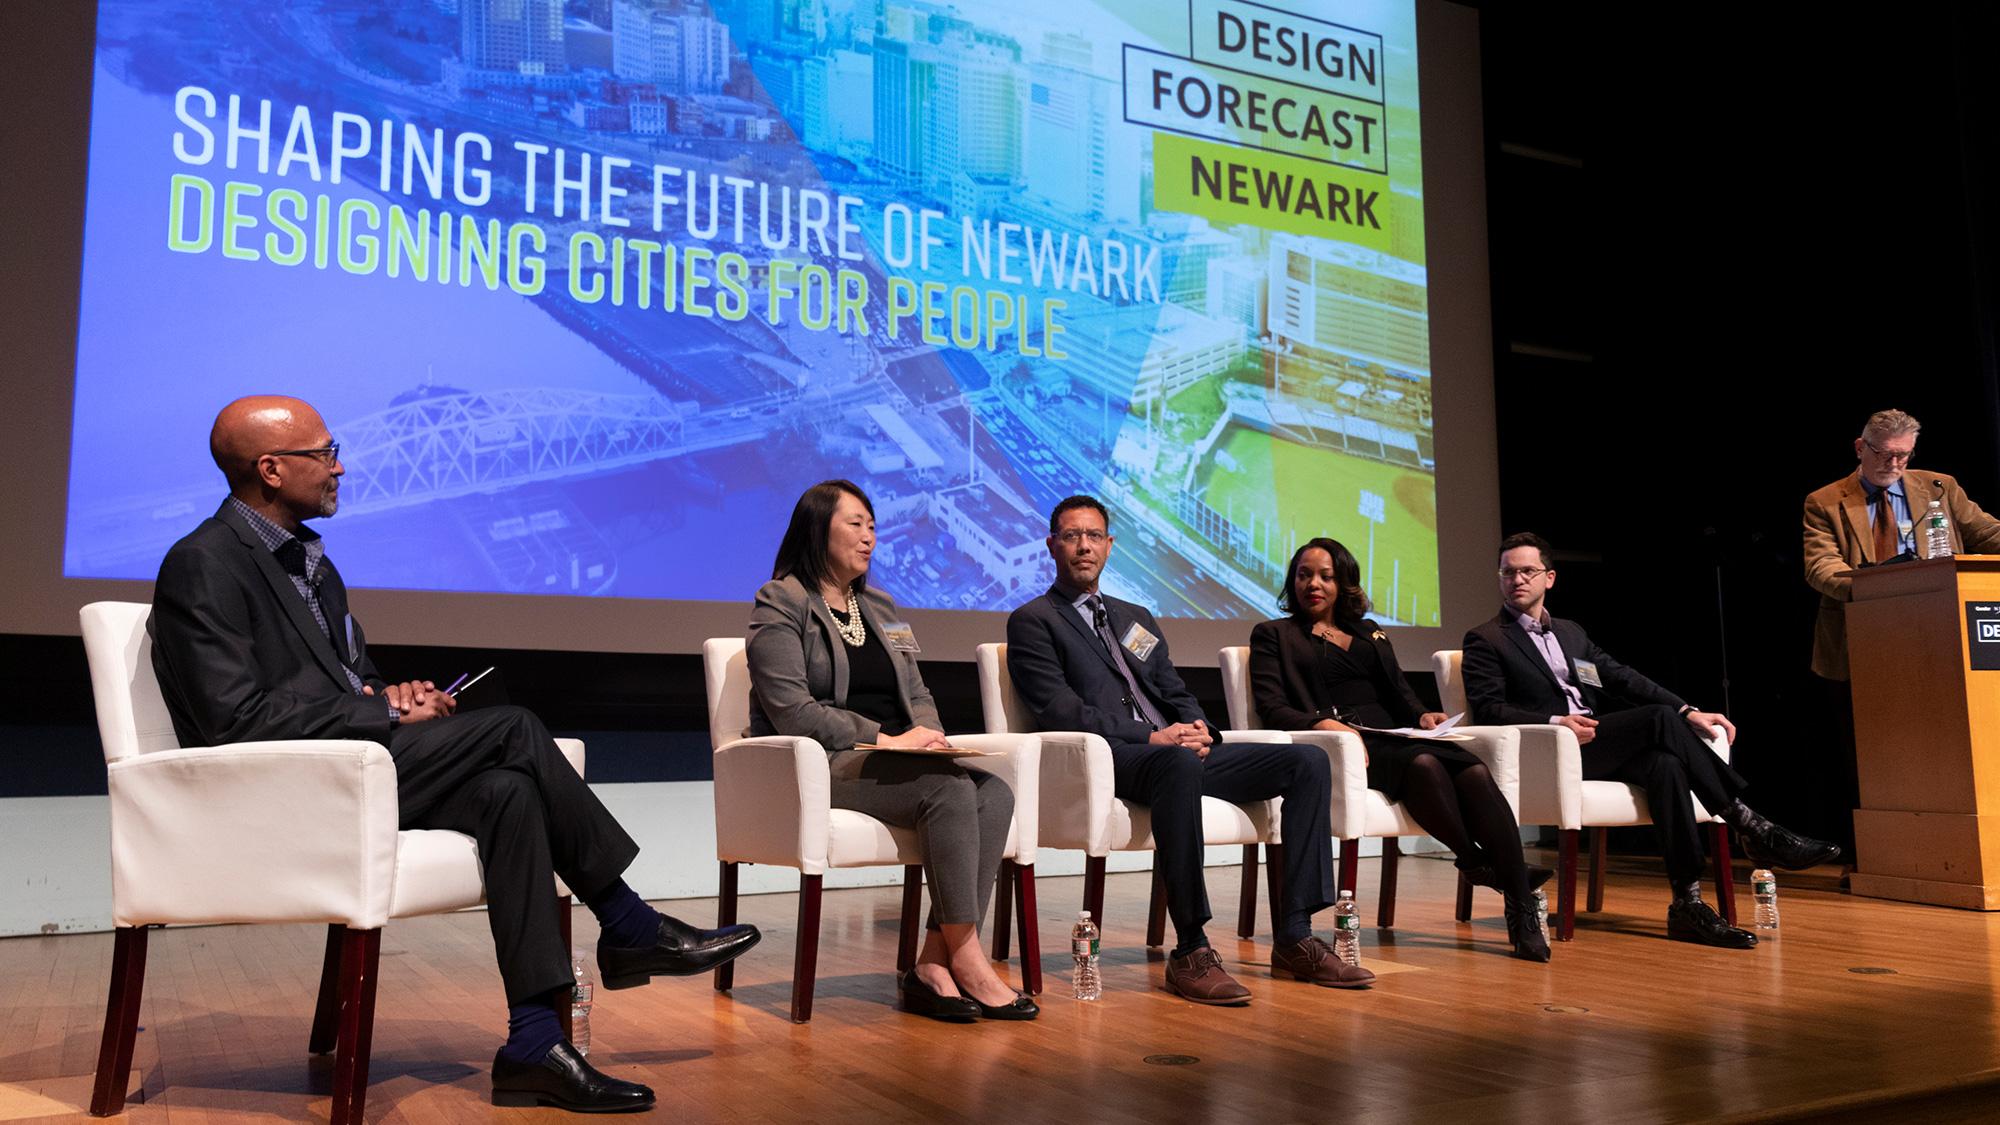 Panelists for Gensler Morristown's Design Forecast Local event